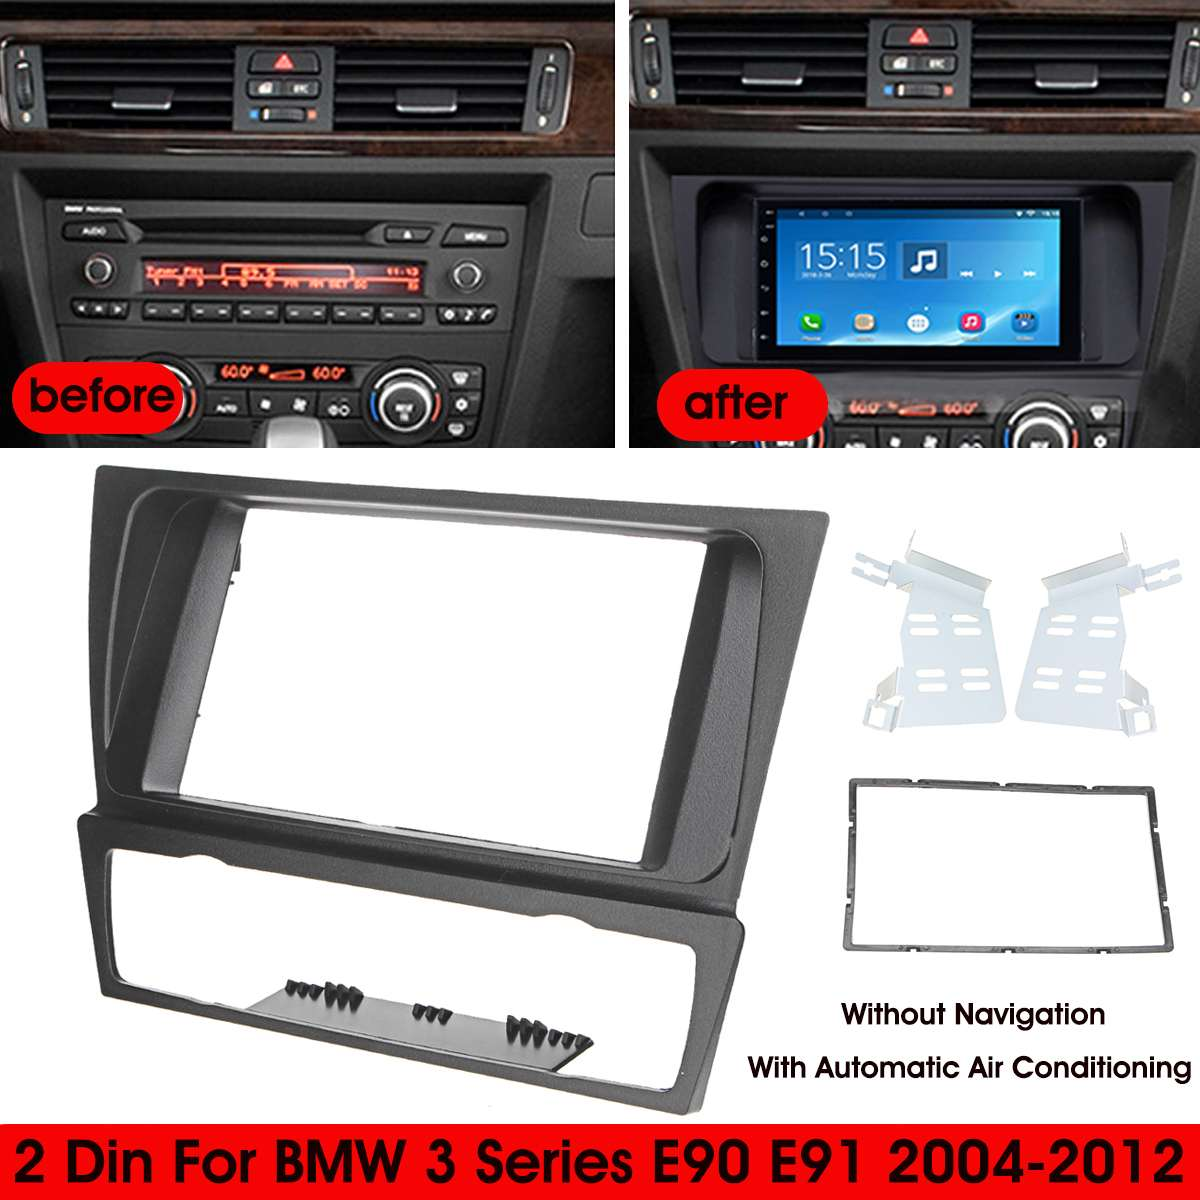 2Din Radio de coche Fascia PVC Marco de Panel CD DVD Dash de Audio cubierta Interior Trim para BMW Serie 3 E90 E91 E92 E93 2004 - 2012